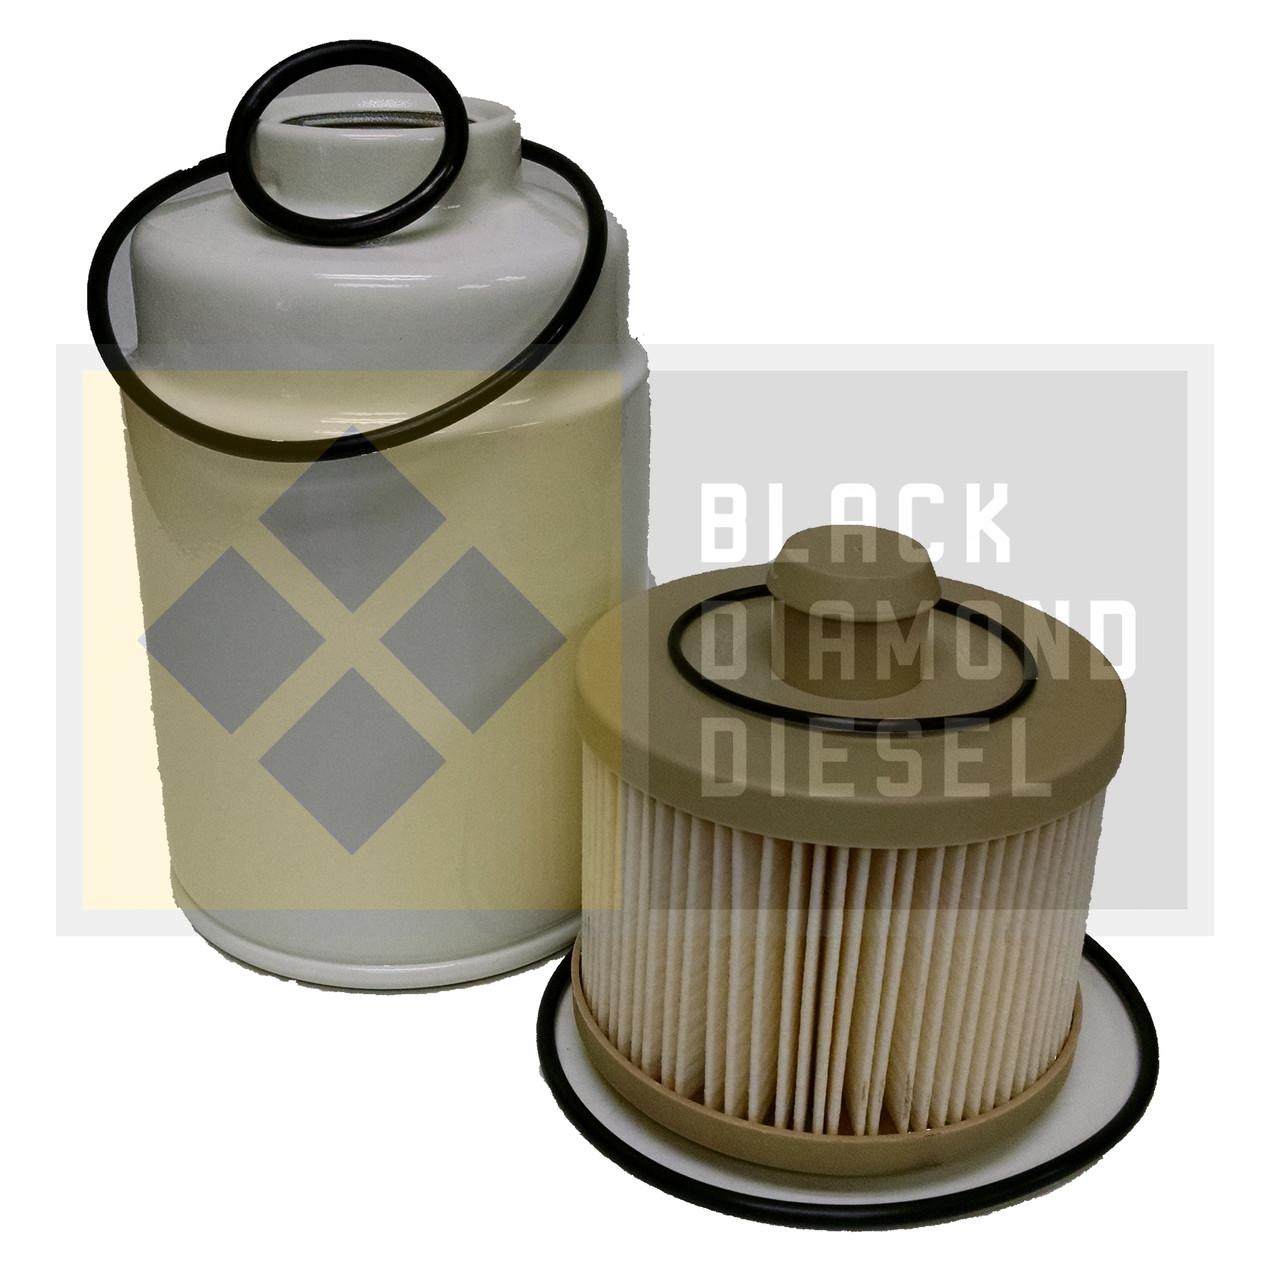 hight resolution of prime guard fuel filter fits 2006 2012 gm 6 6 duramax diesel van bdspdf75888